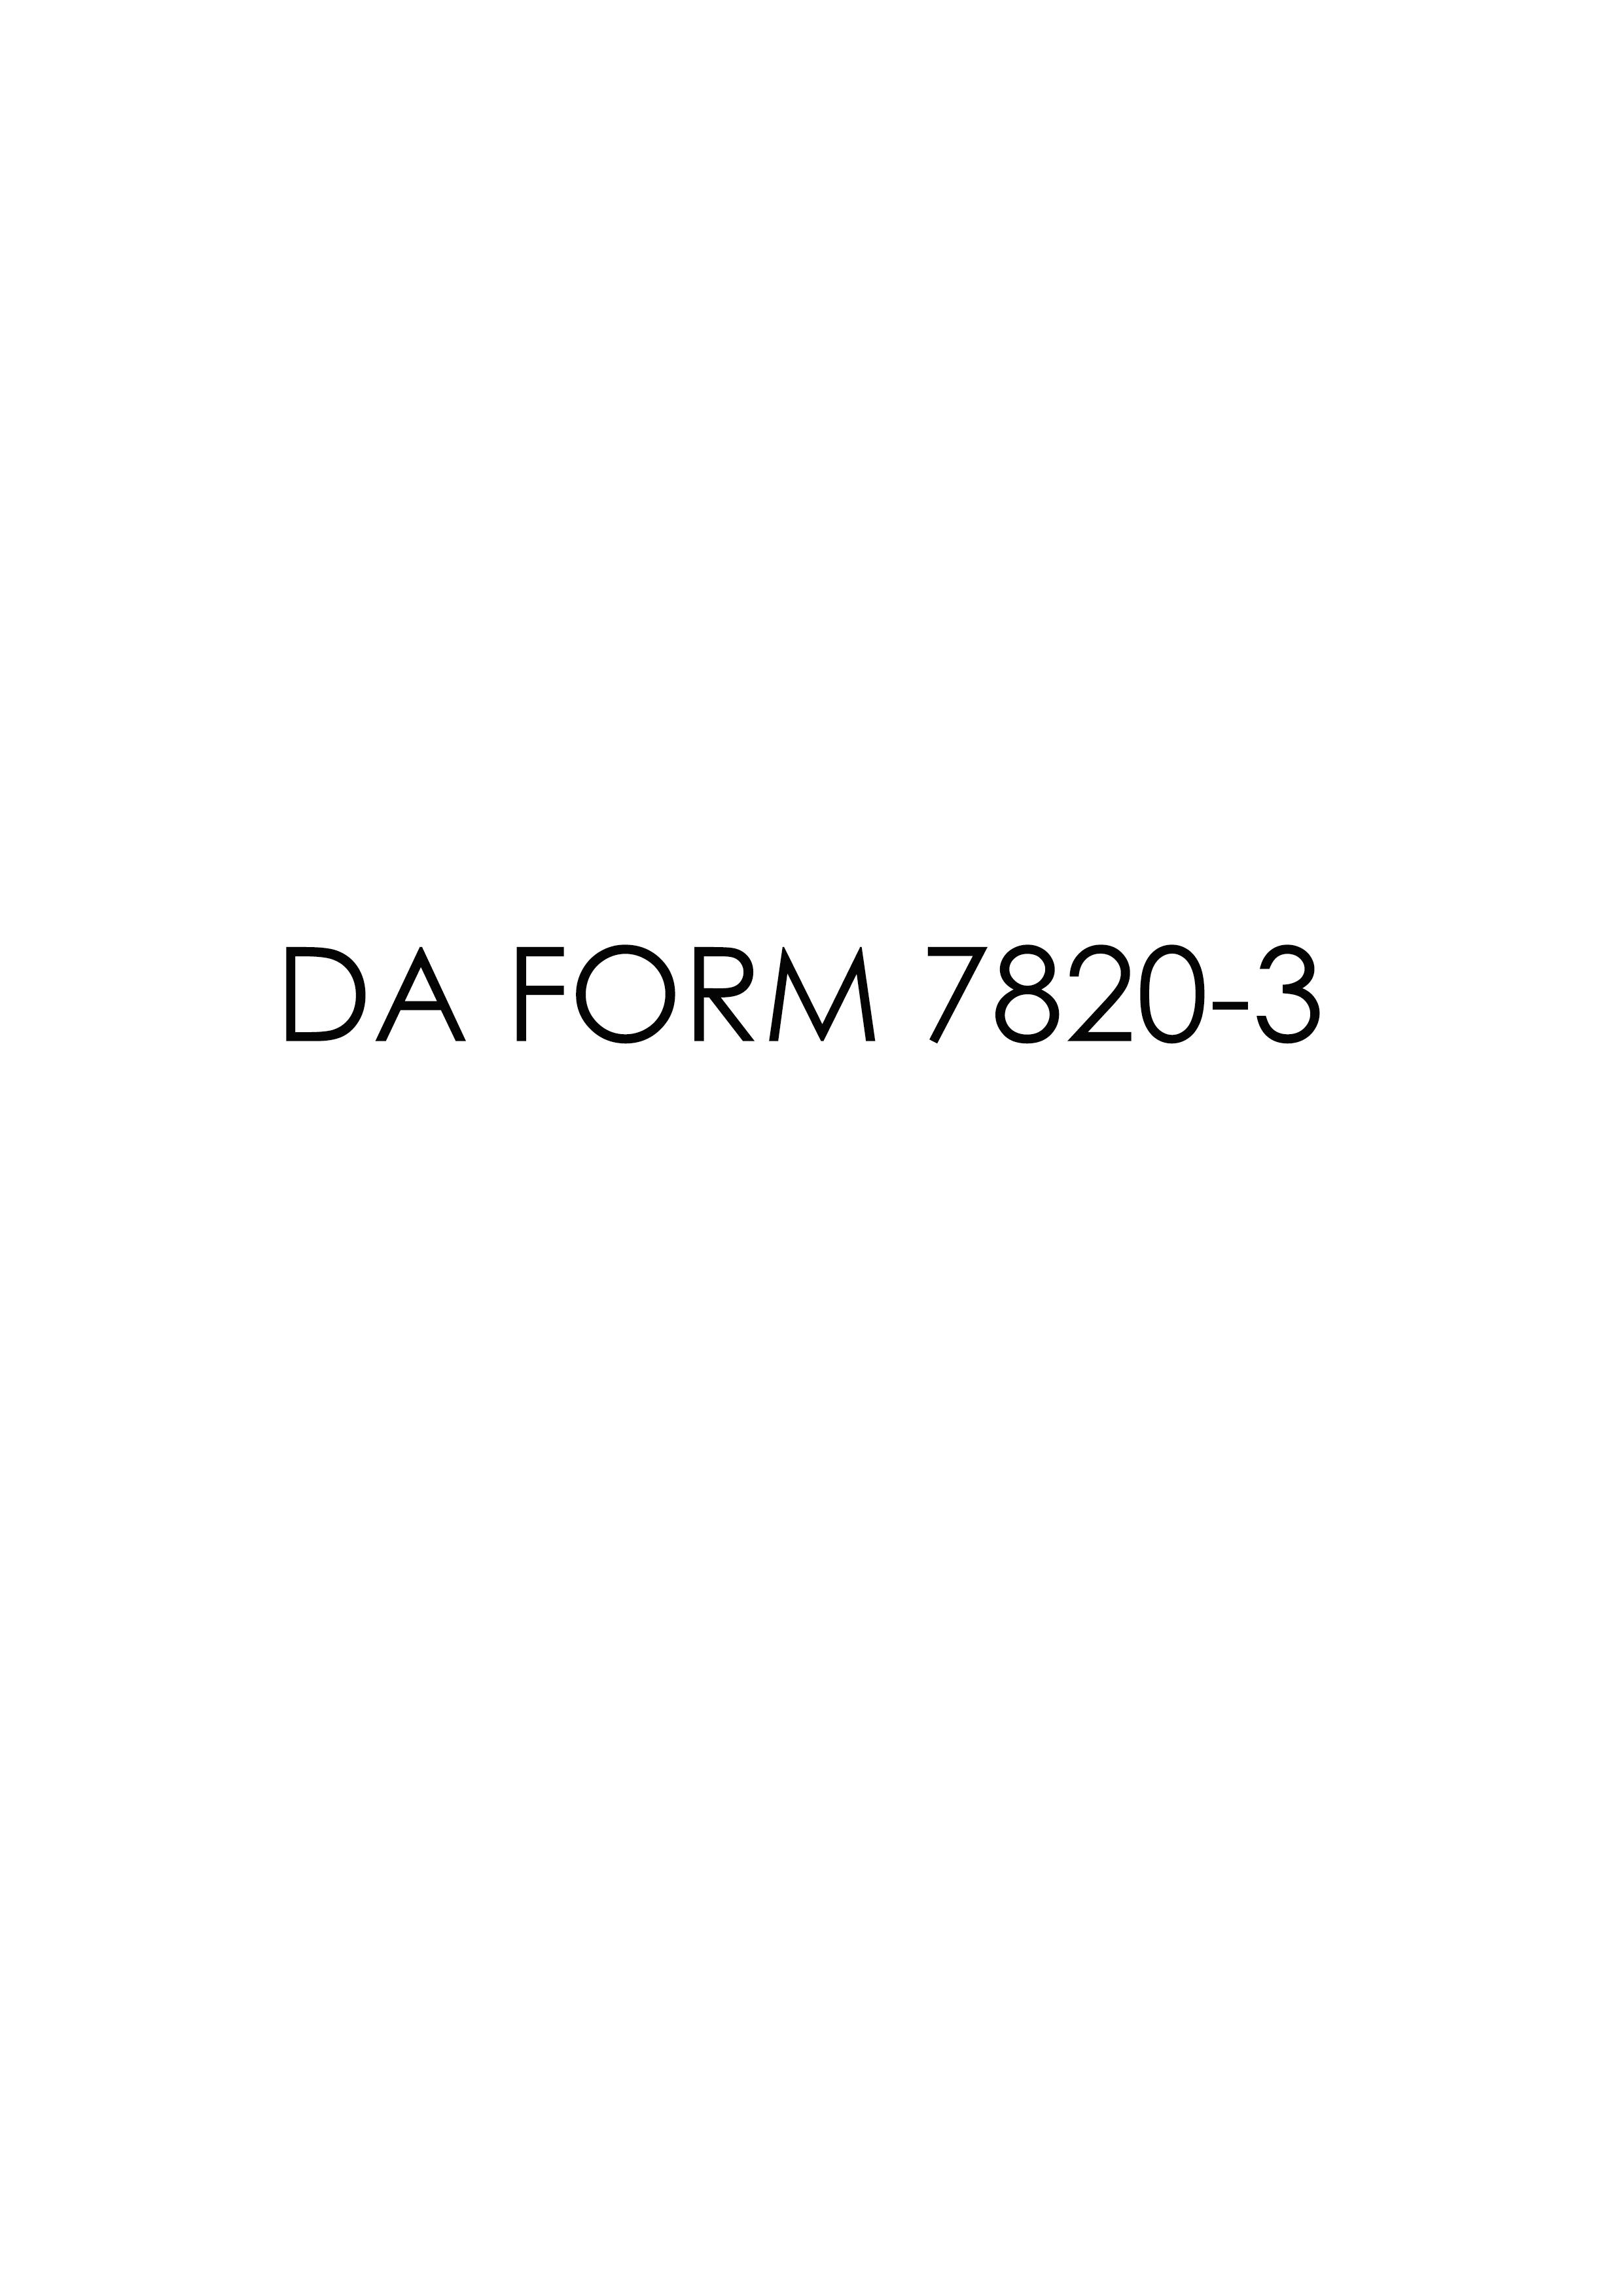 Download da Form 7820-3 Free